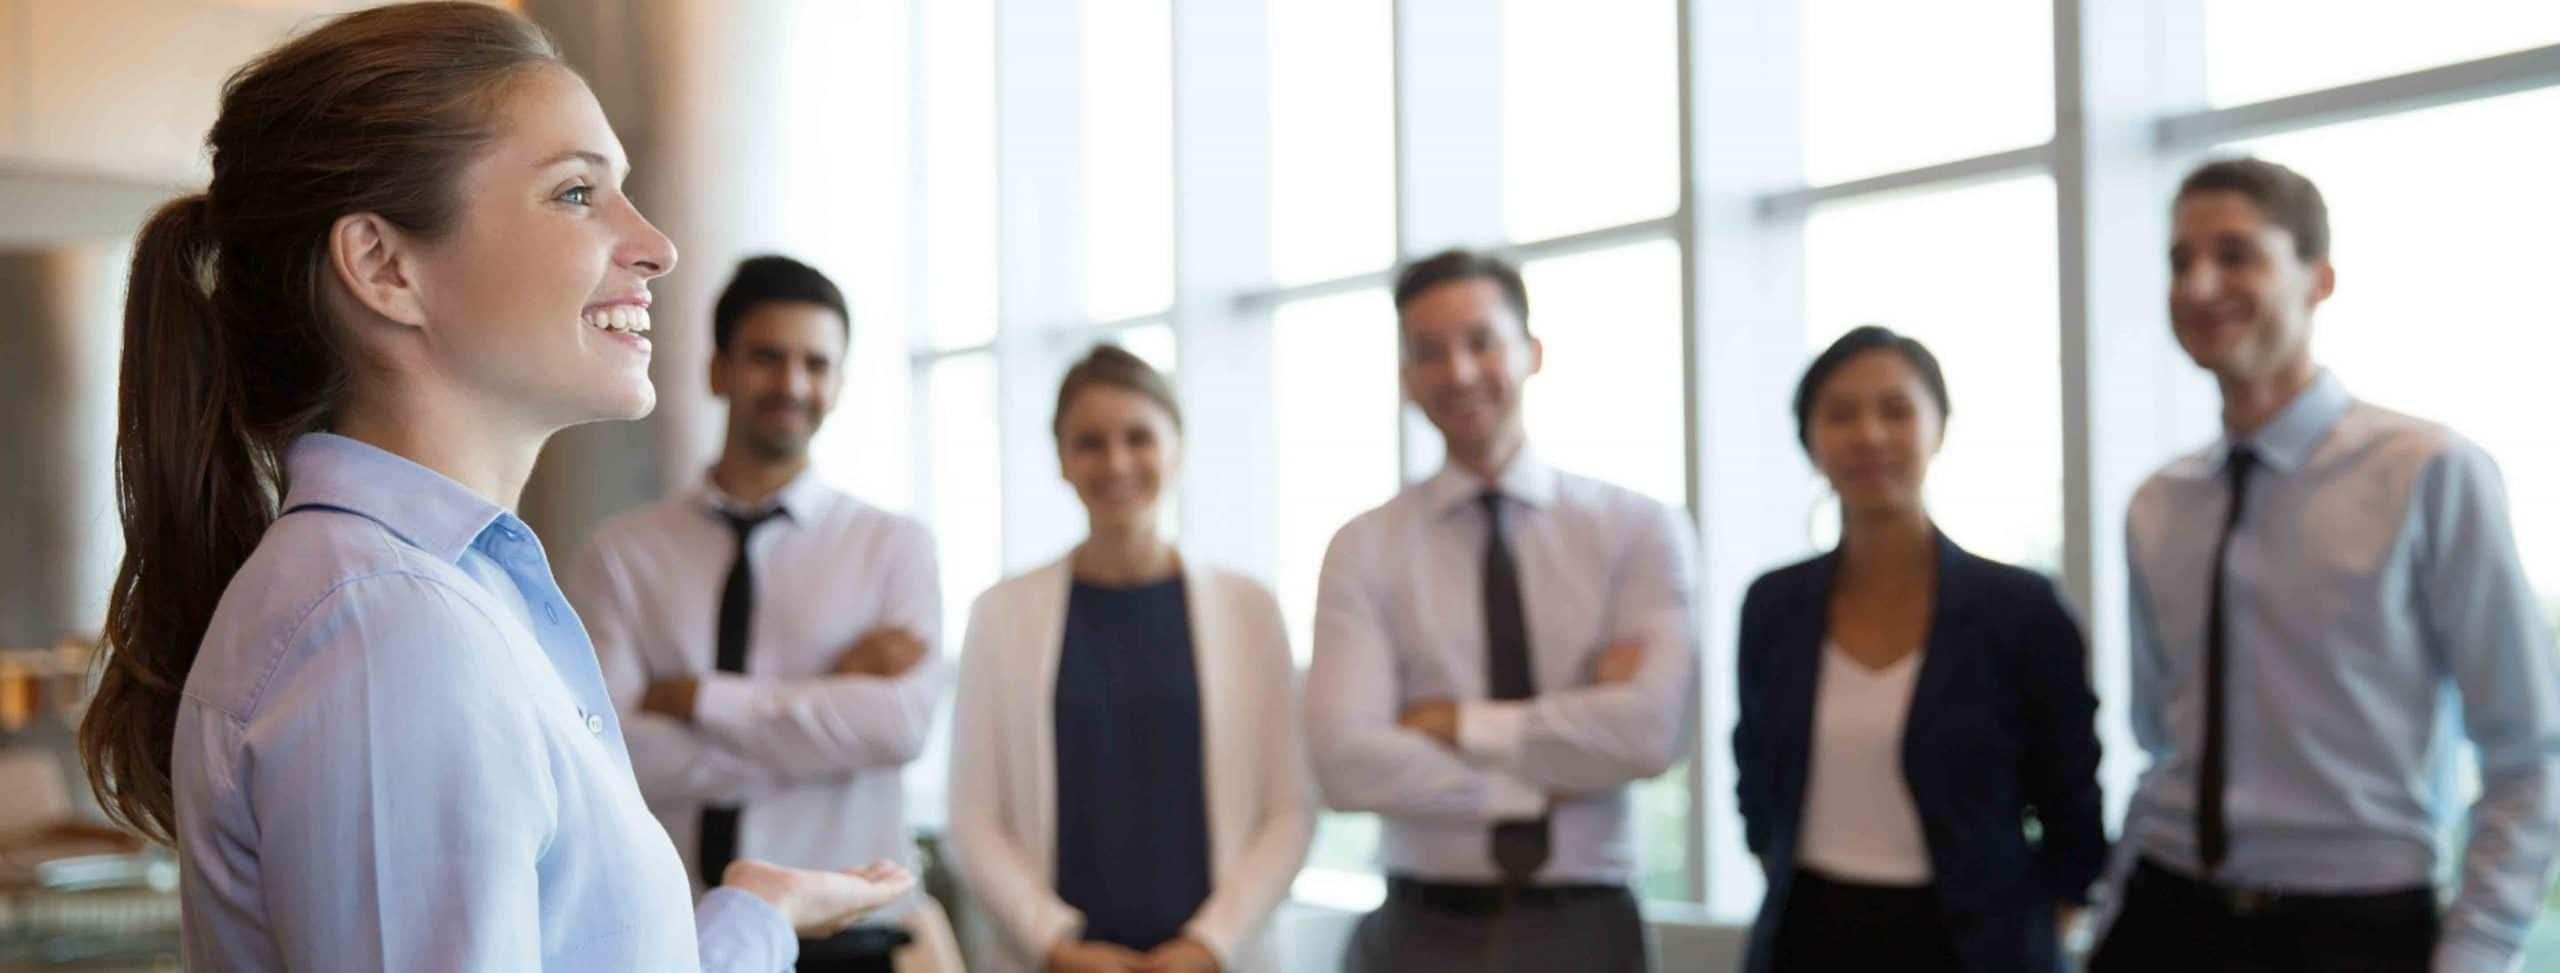 soluciones integrales de ingles empresarial